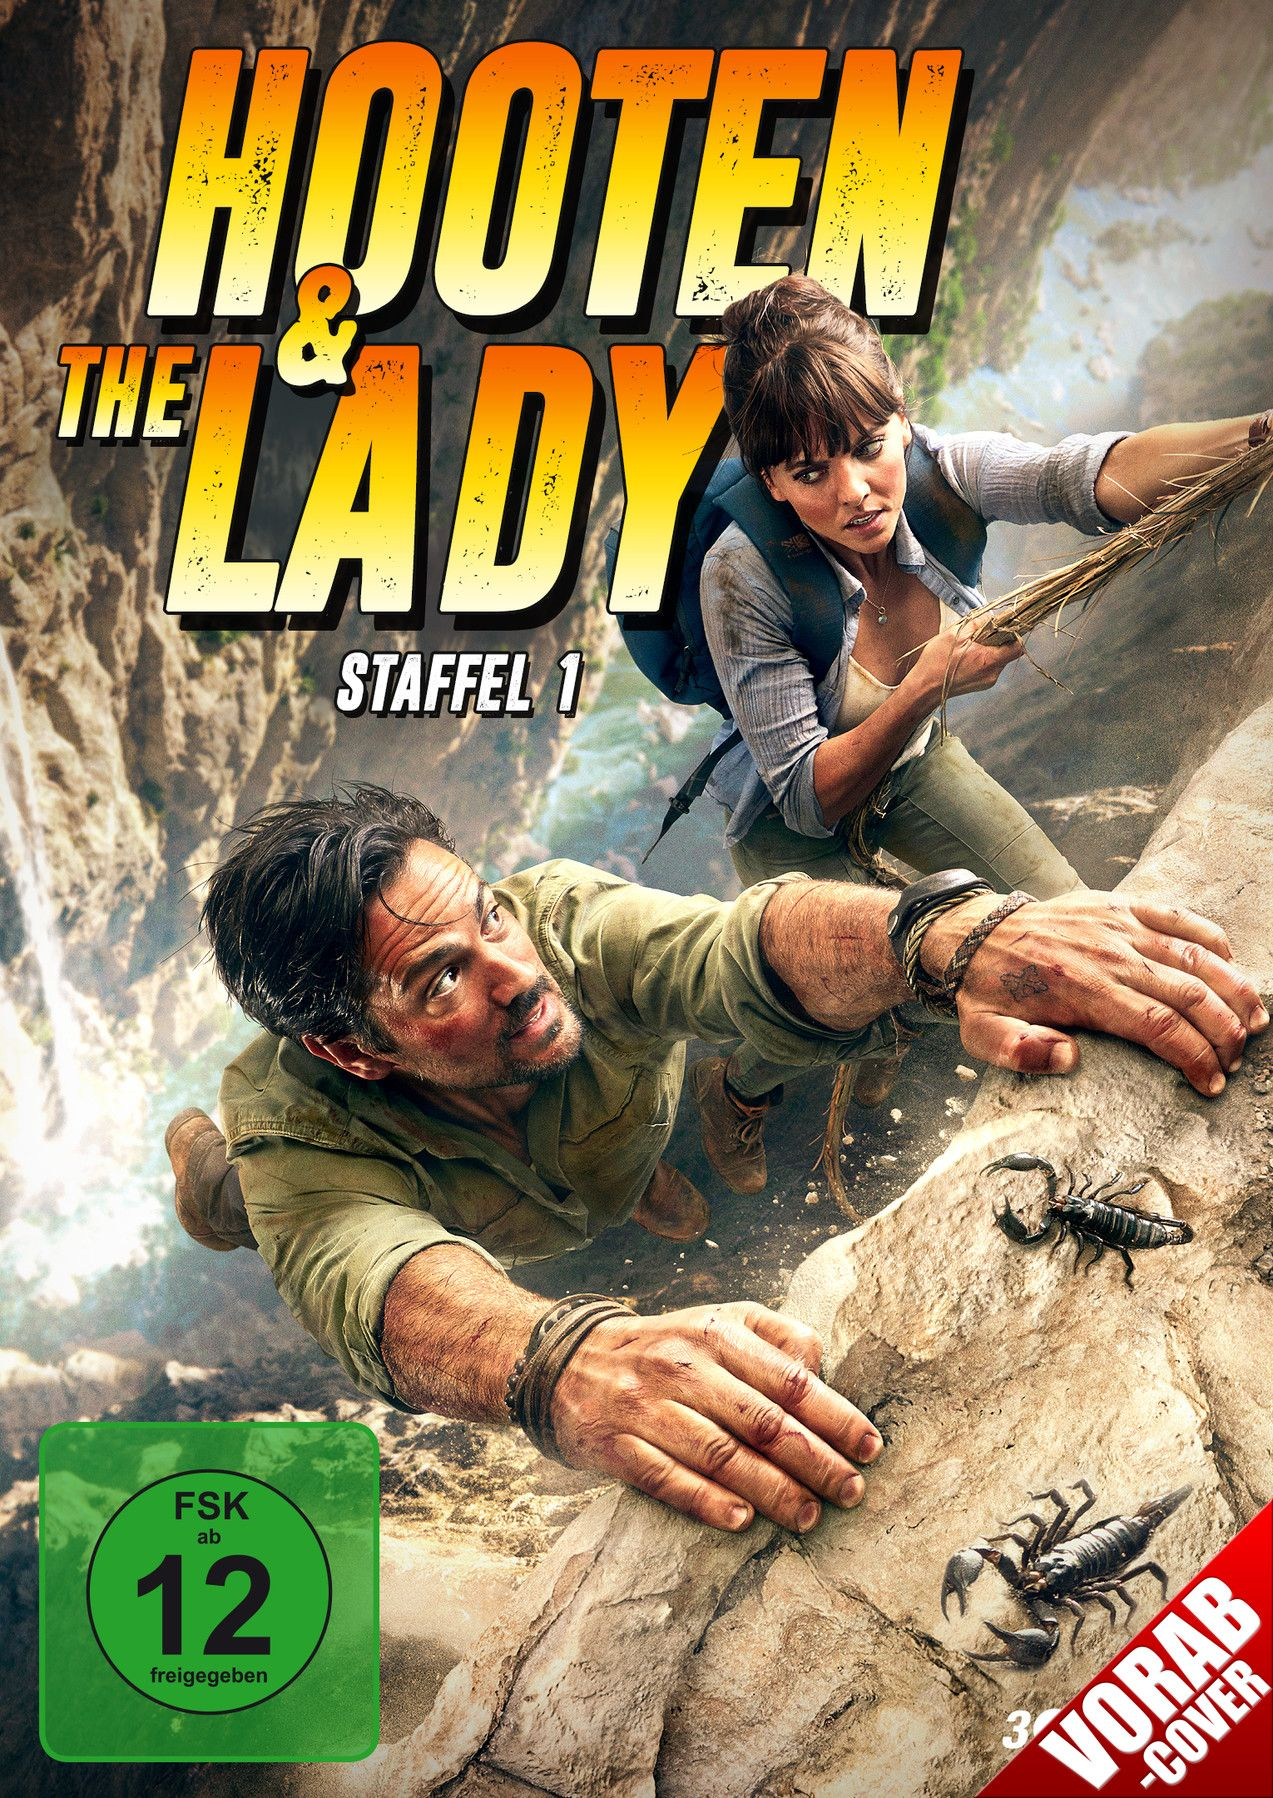 Hooten & the Lady - Staffel 1 (3 Discs)